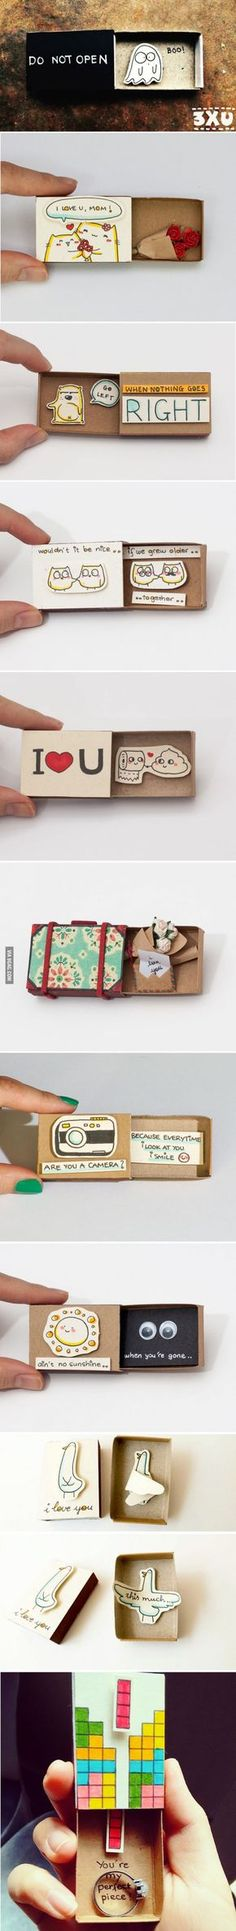 Artist creates little matchbox greeting cards with hidden messages inside (part I)